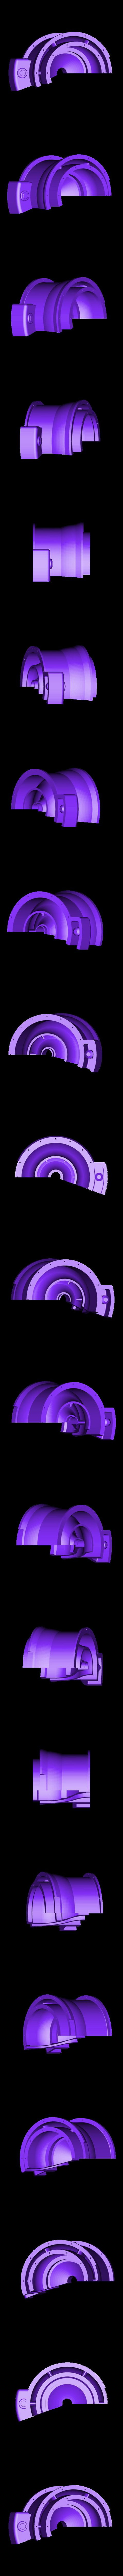 Air-Intake-Case101.stl Download free STL file Turboprop Engine • 3D printable model, konchan77